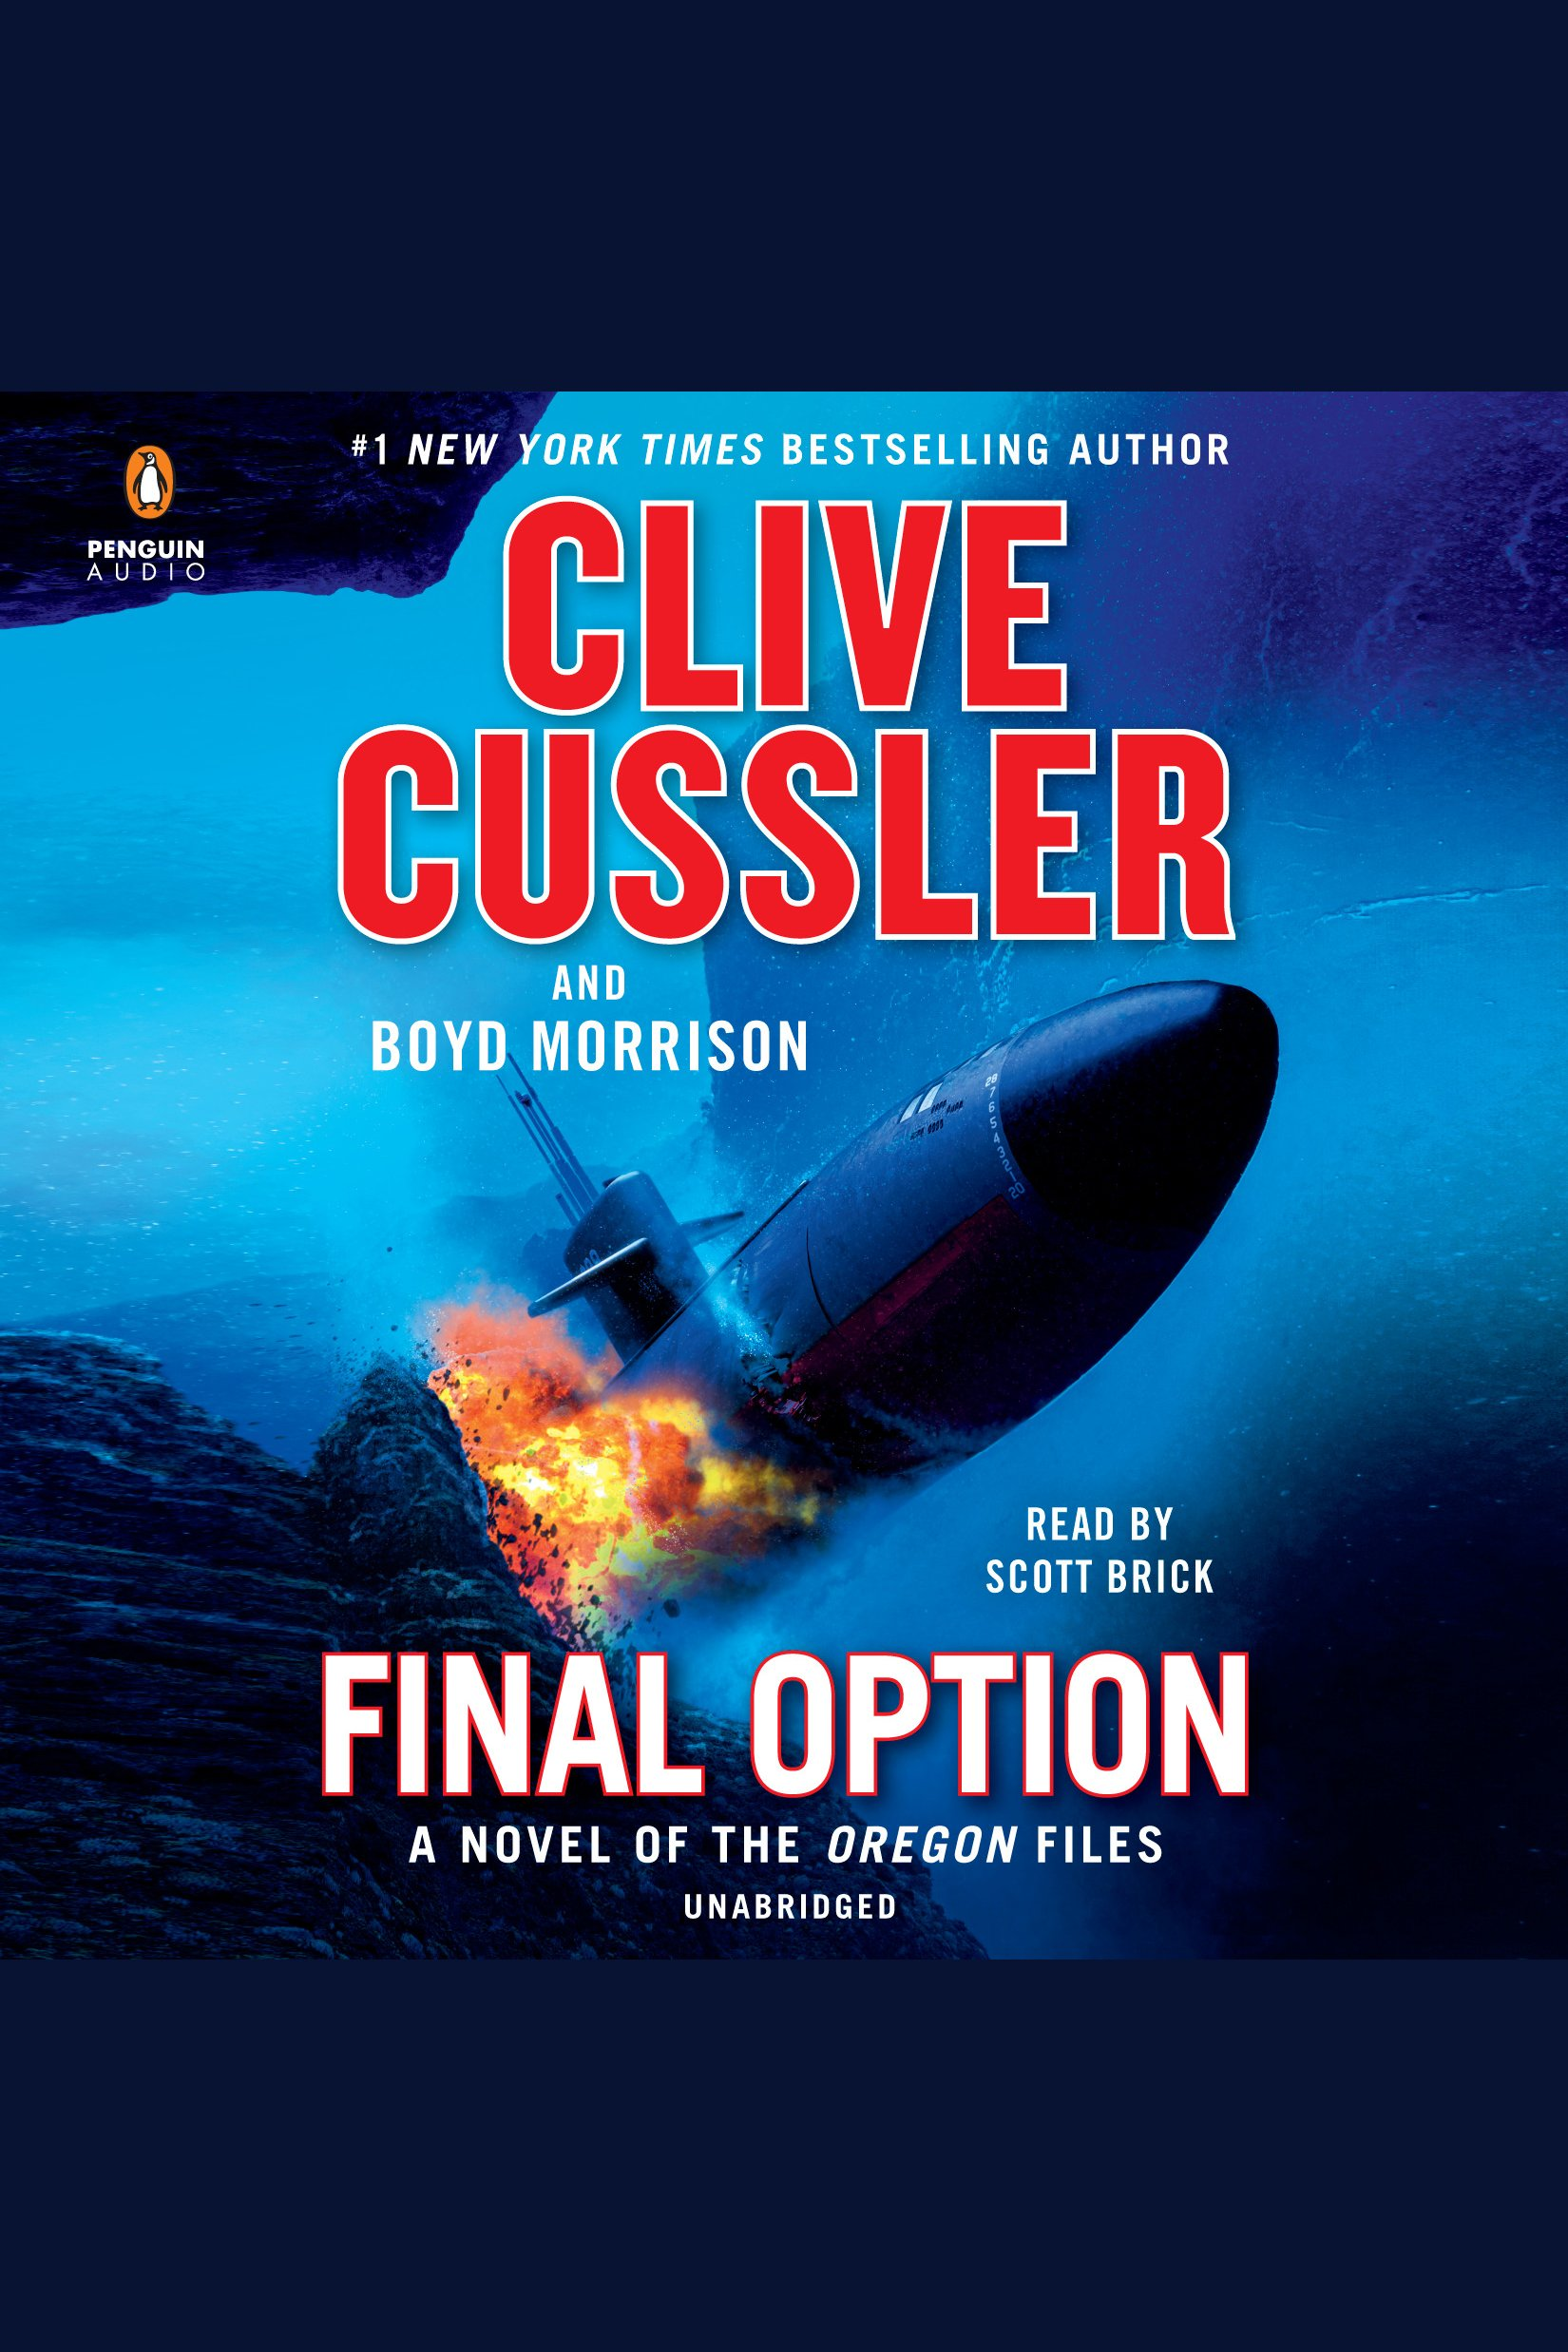 Final Option A Novel of the Oregon Files